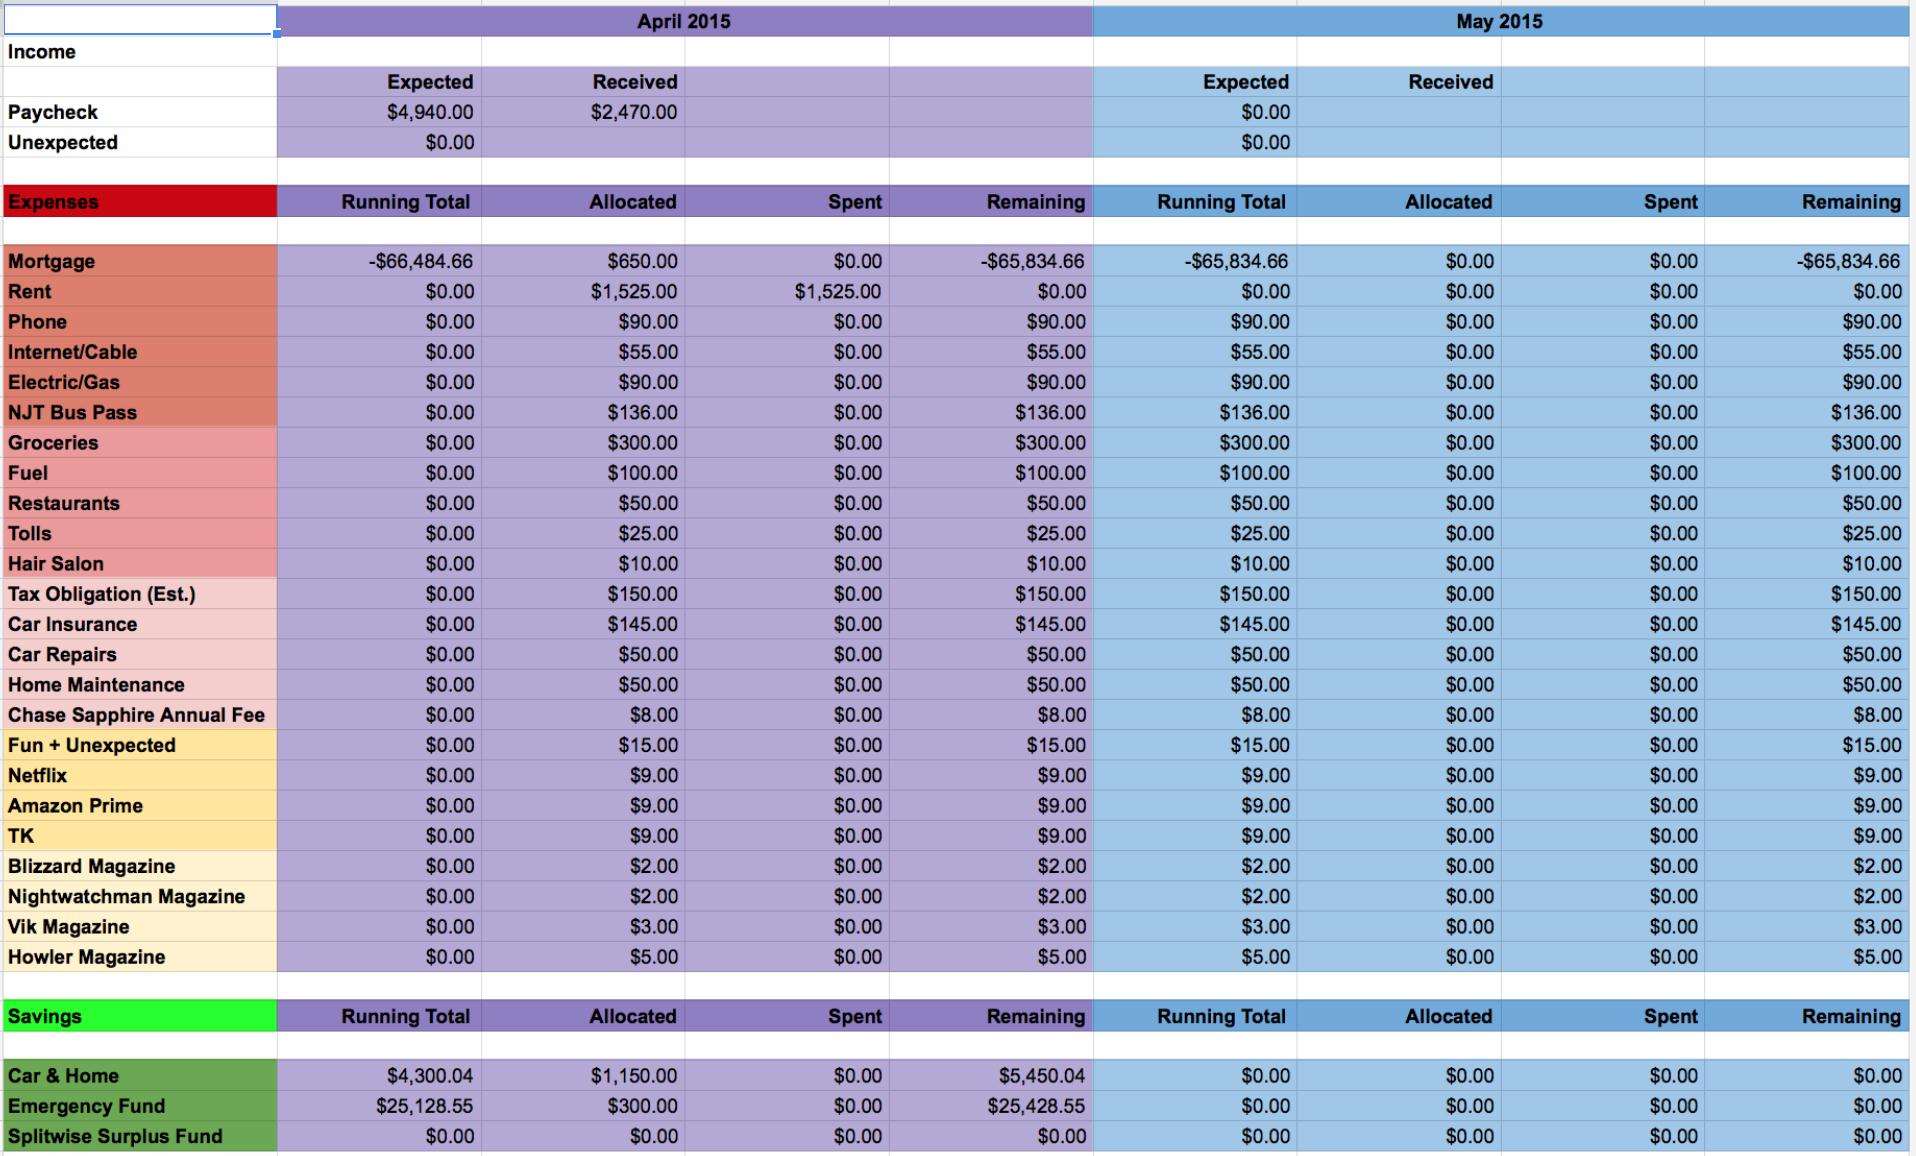 Ynab Spreadsheet Download For Ynab In Excel : Personalfinance